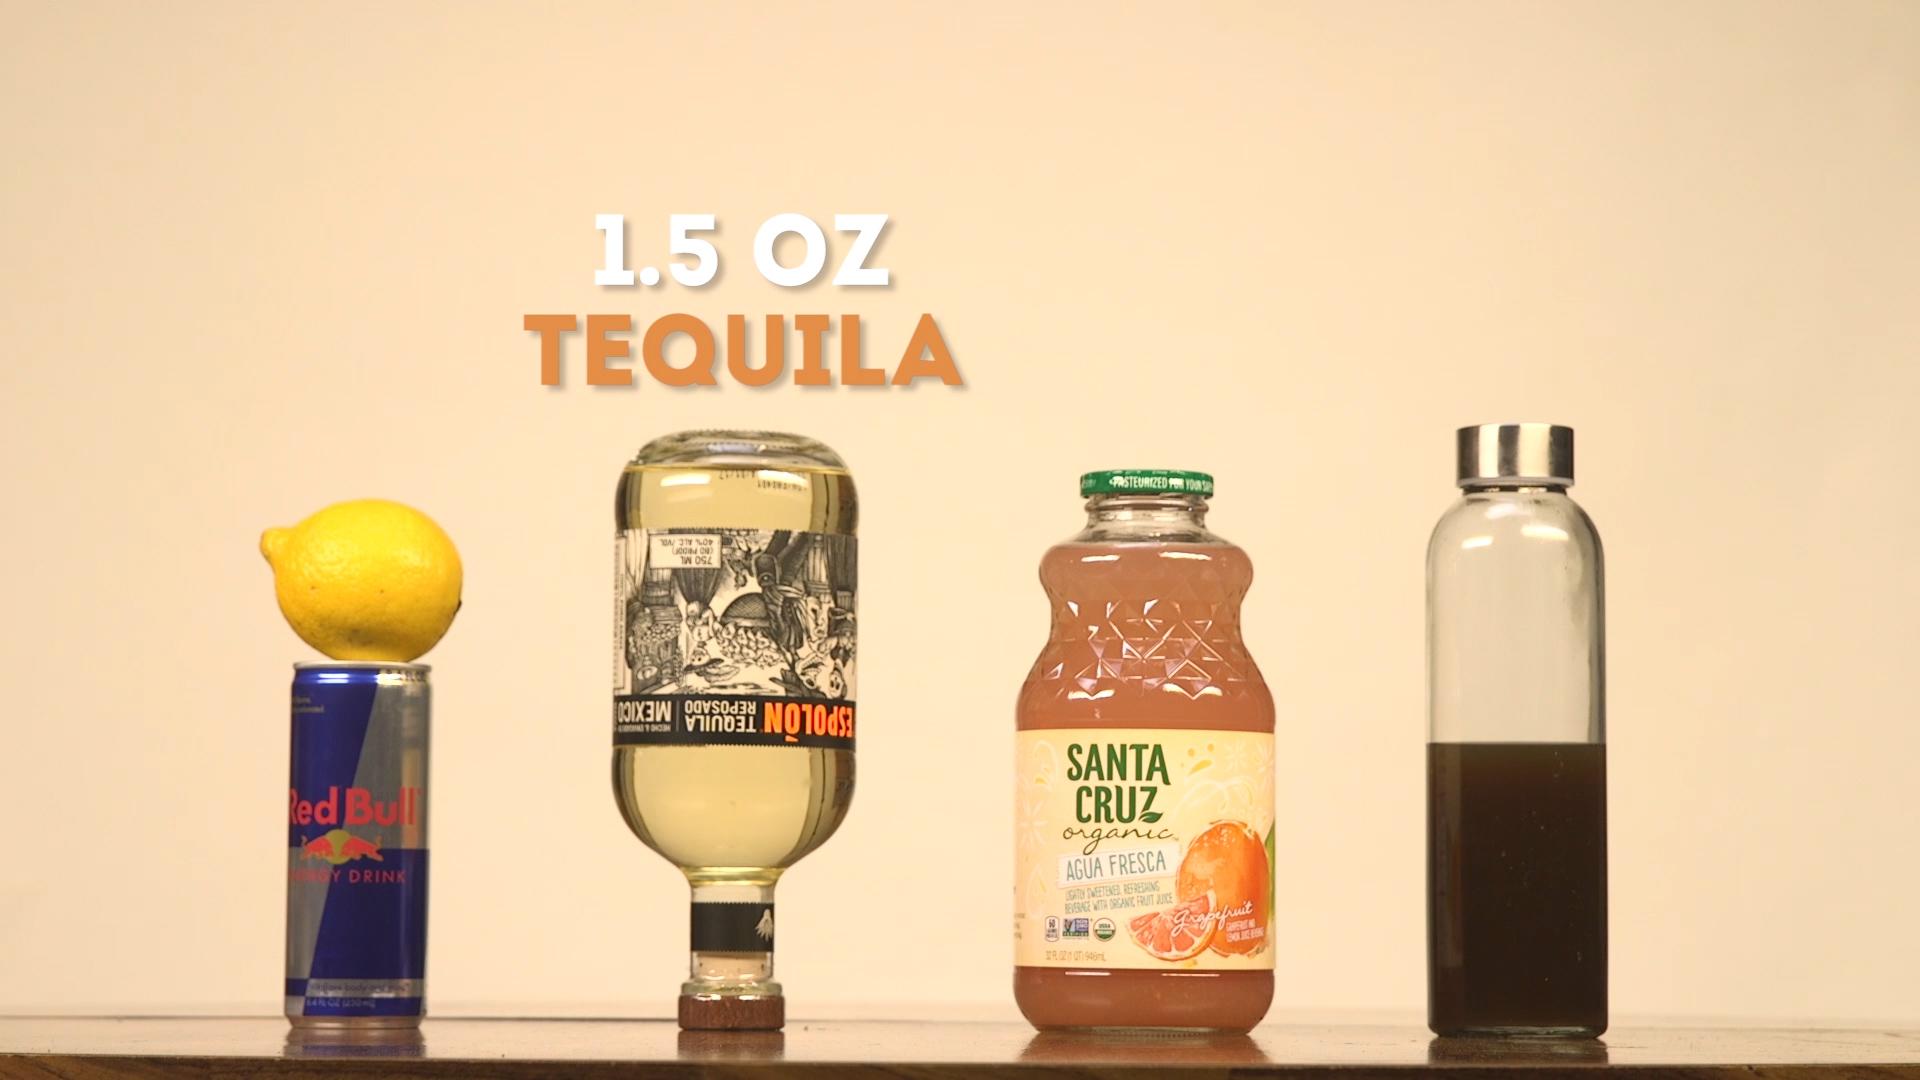 TequilaWakeAndBake 2.jpg